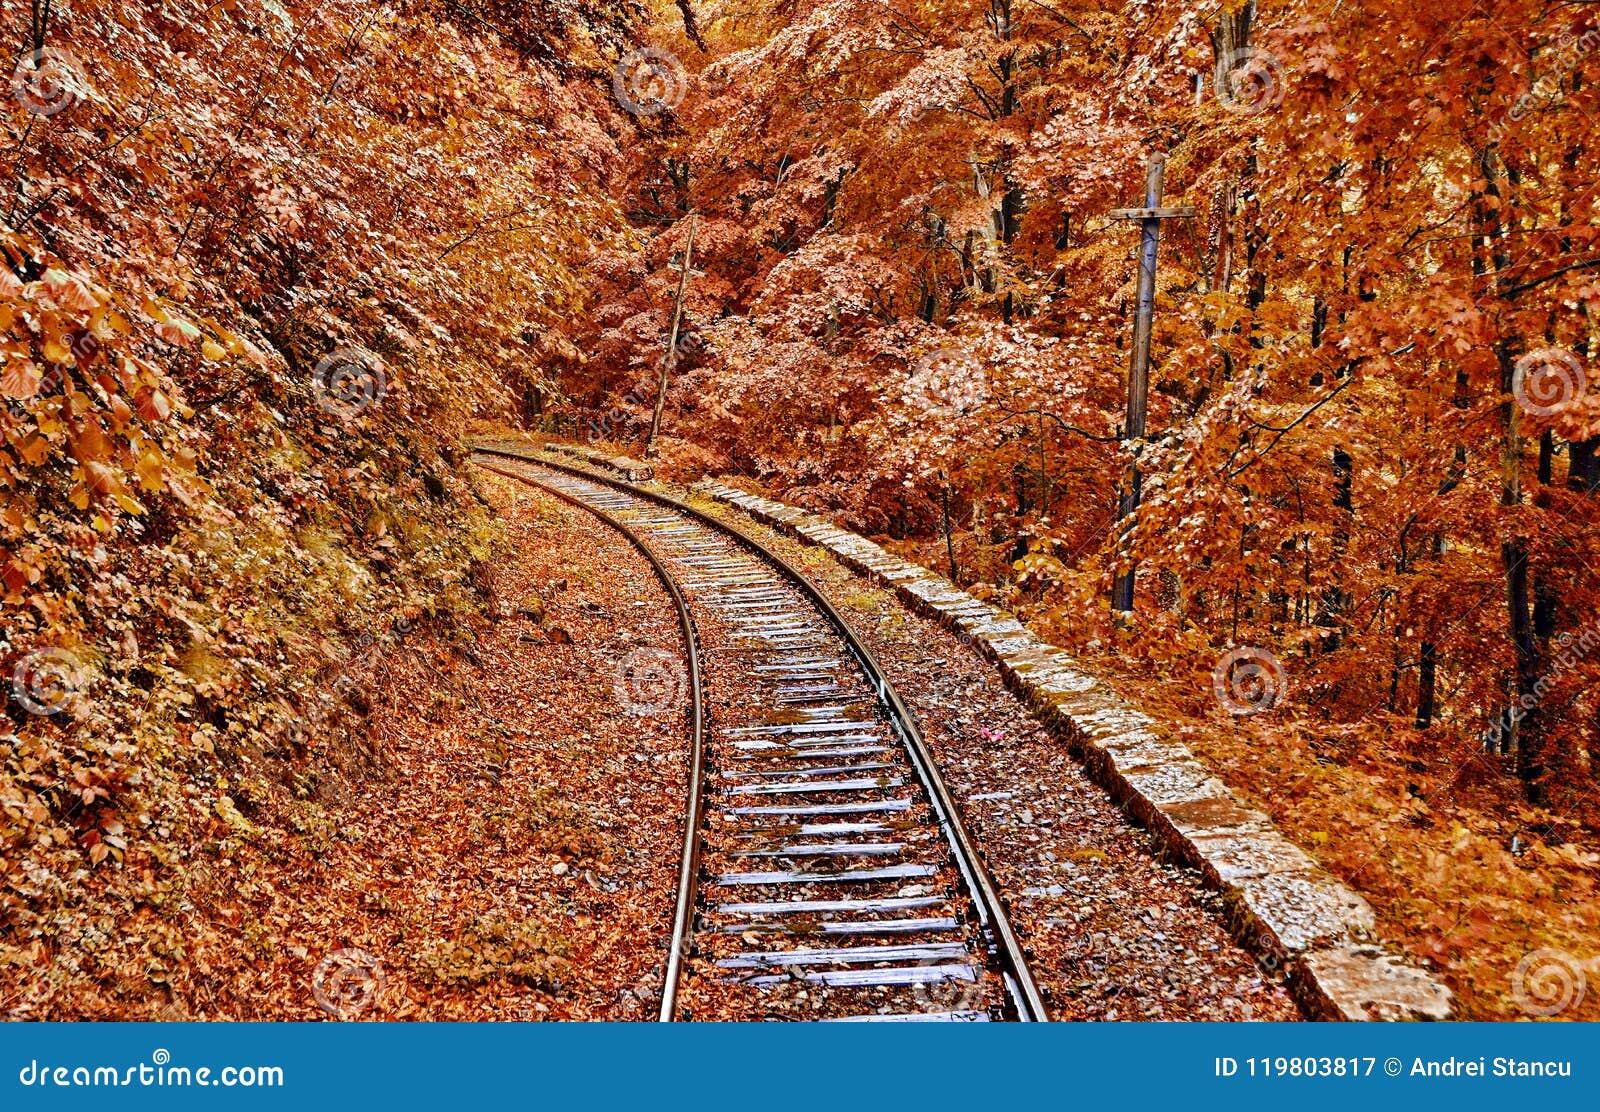 Autumn Forest Railroad